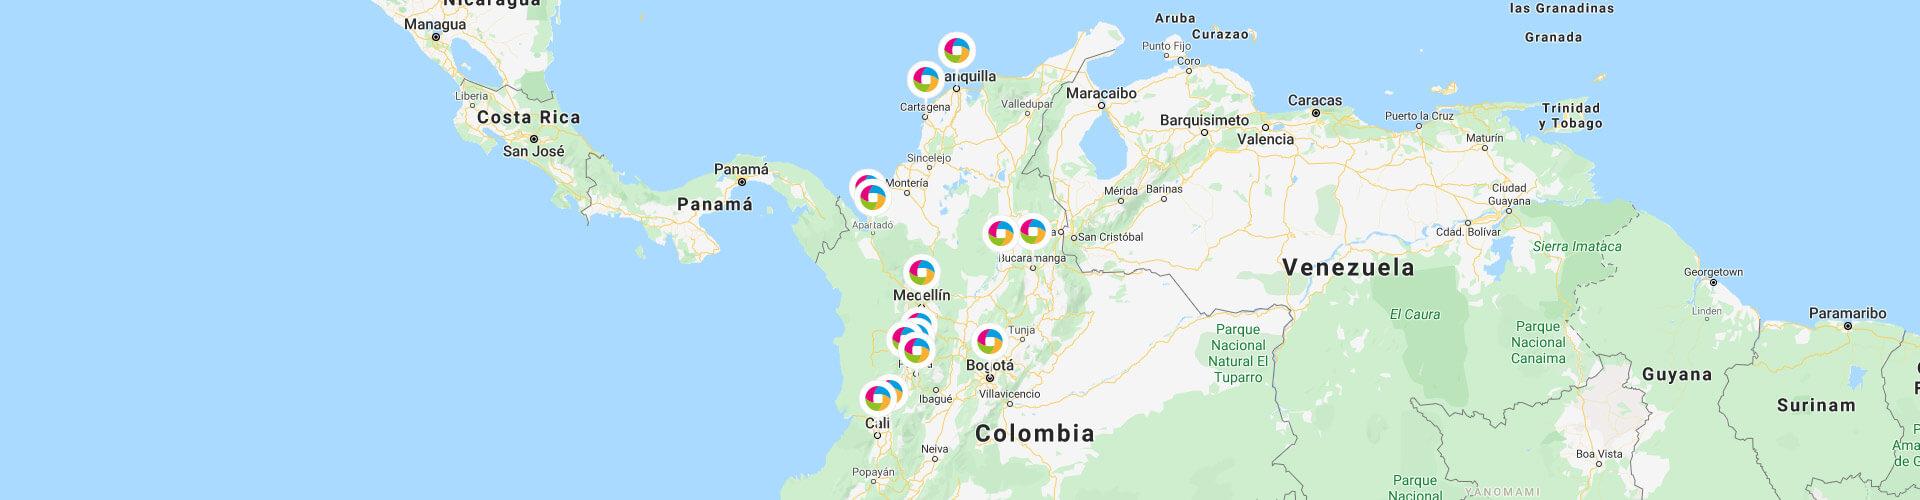 mapa-pc